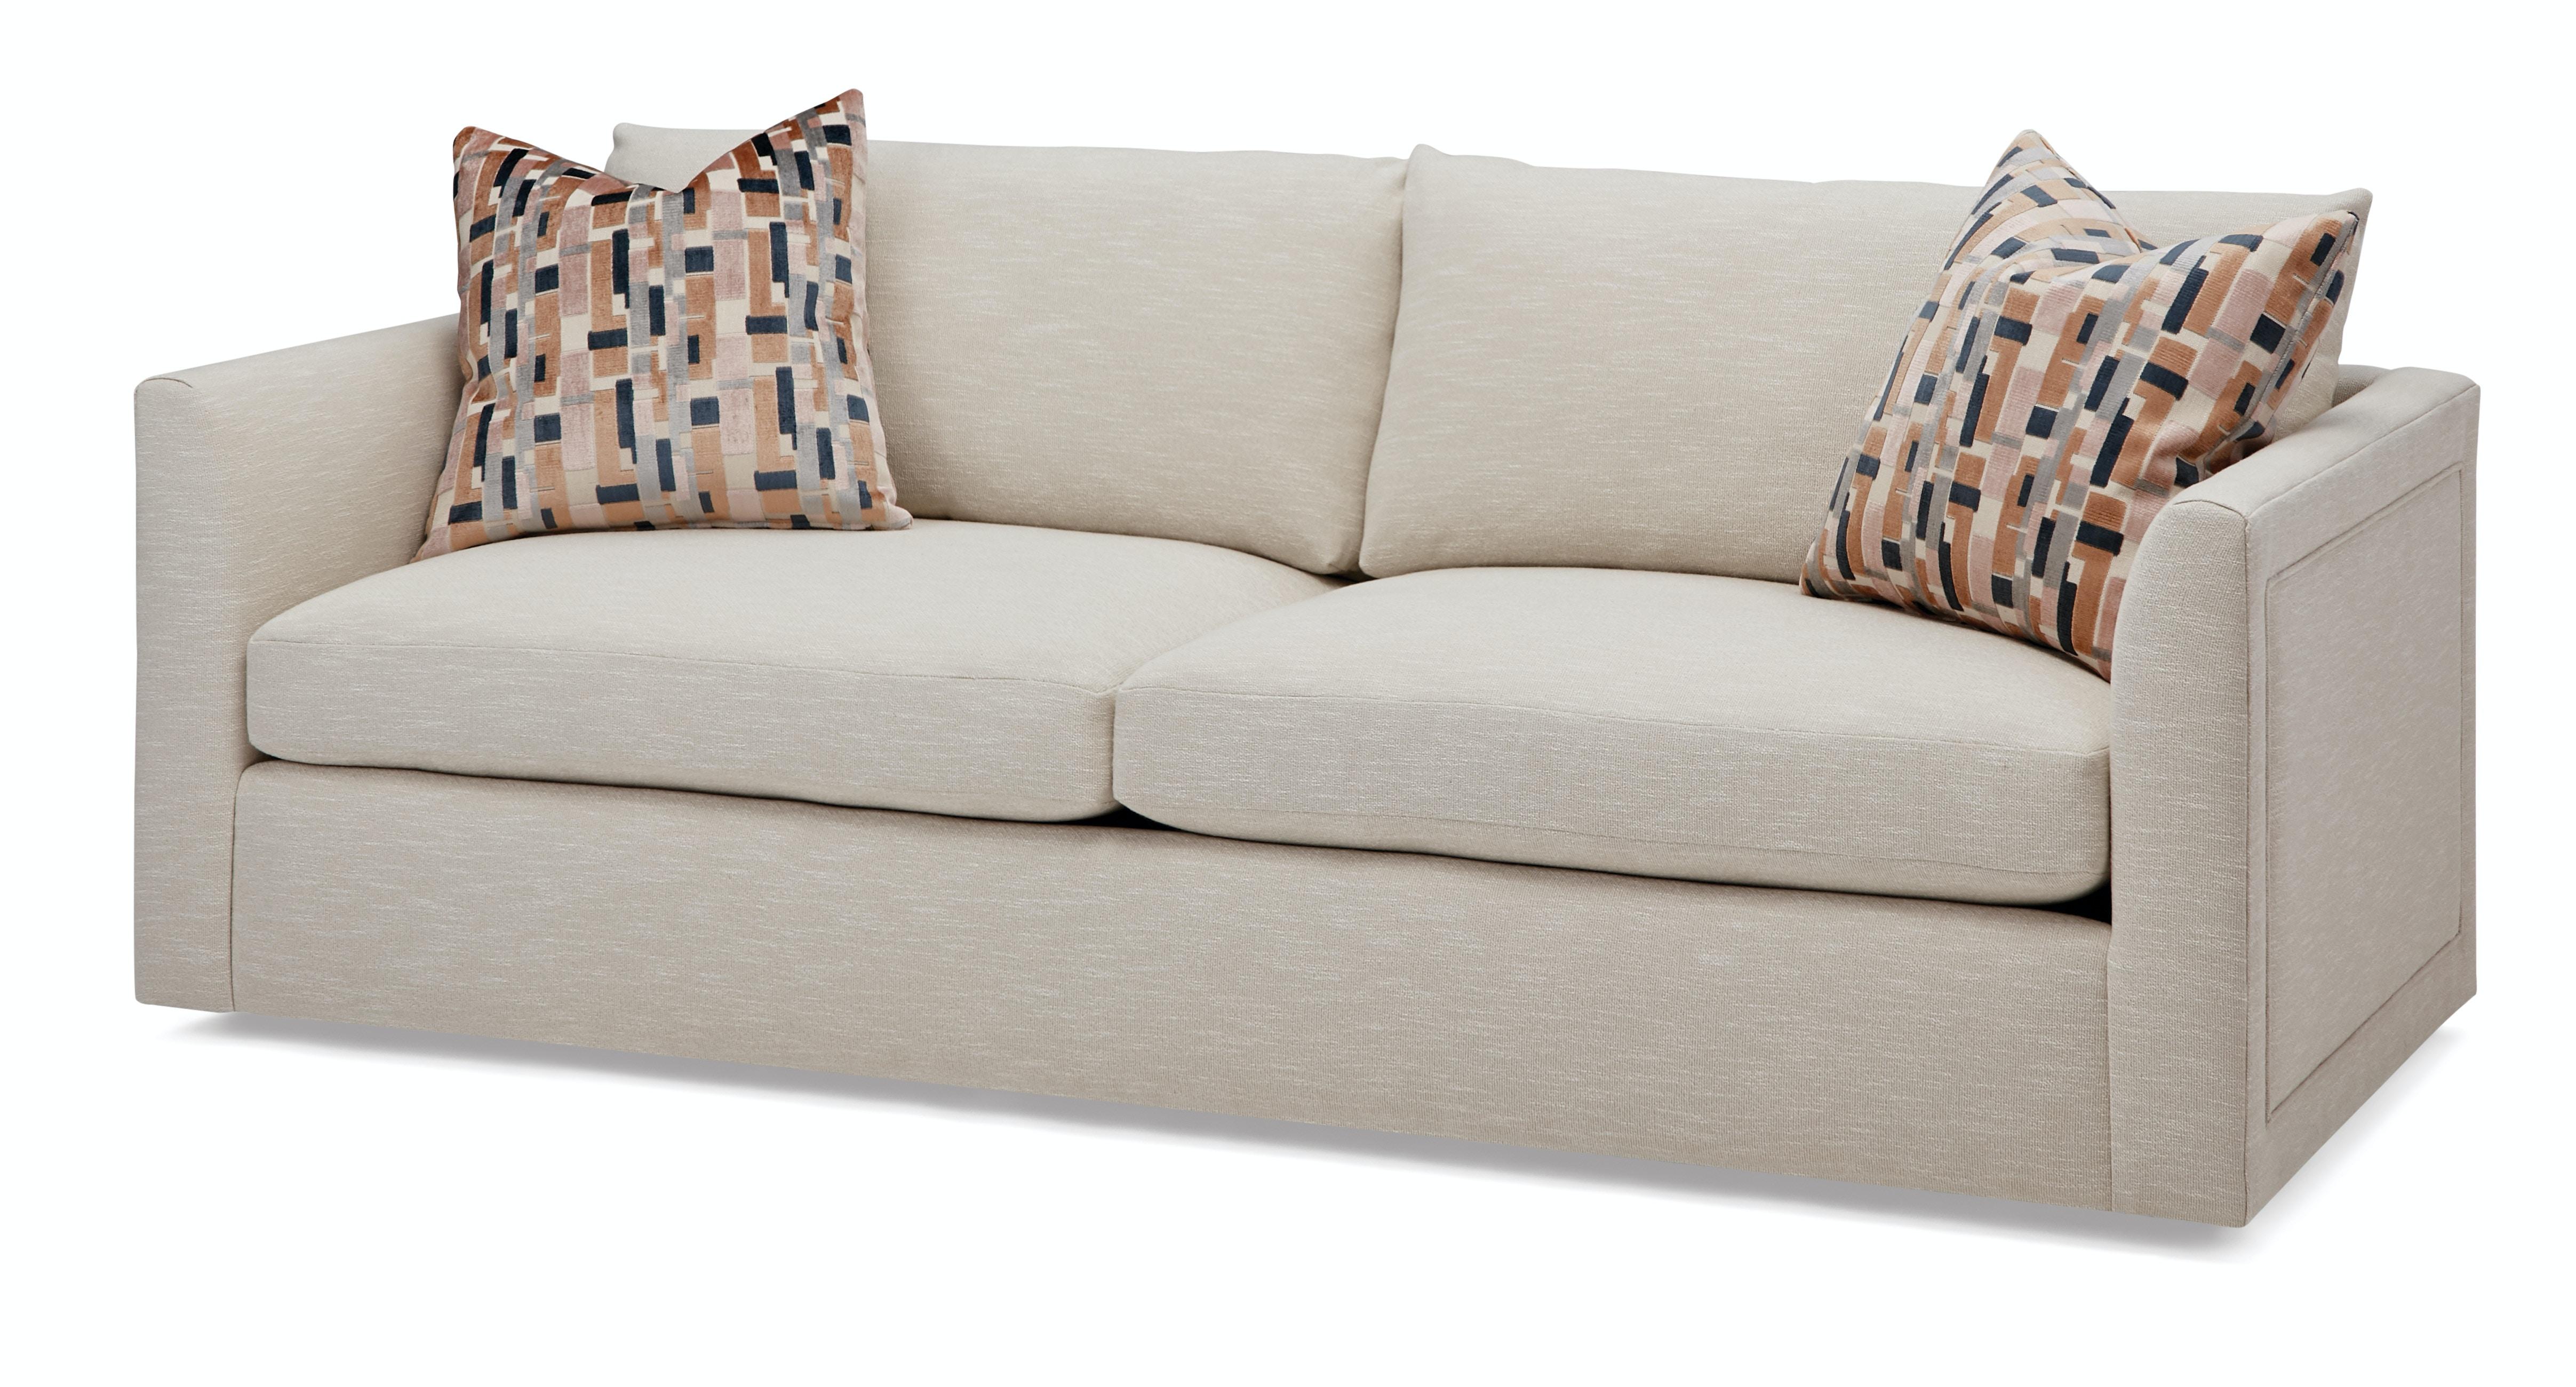 Norwood Furniture